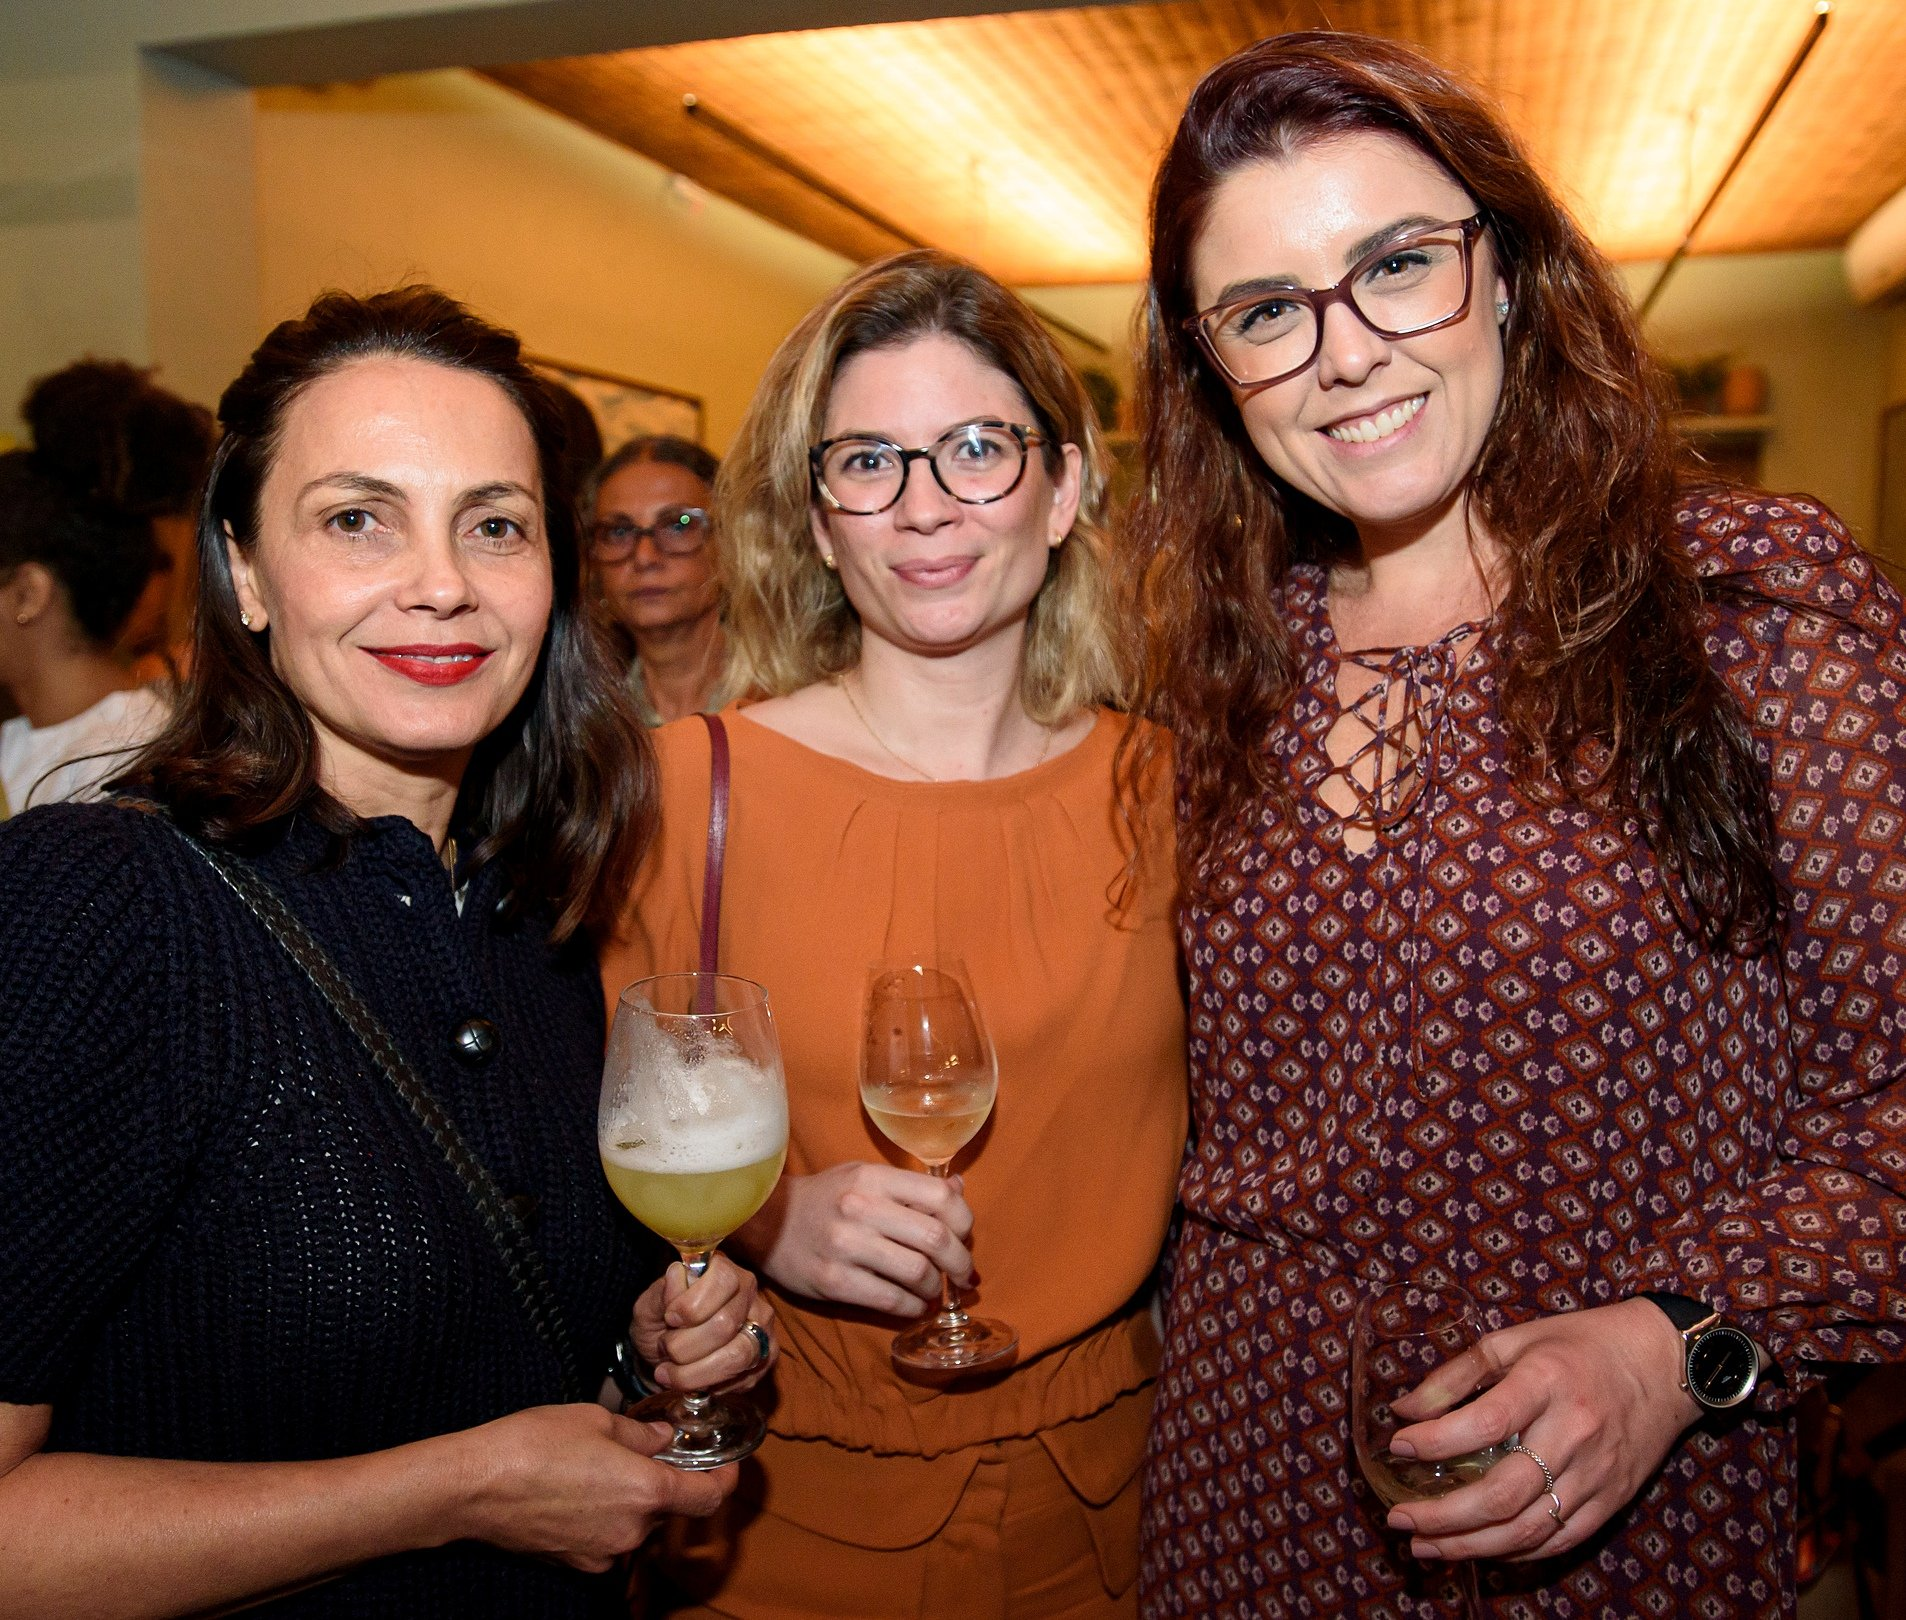 Joana Munne, Andrea sabino e Luana Cloper